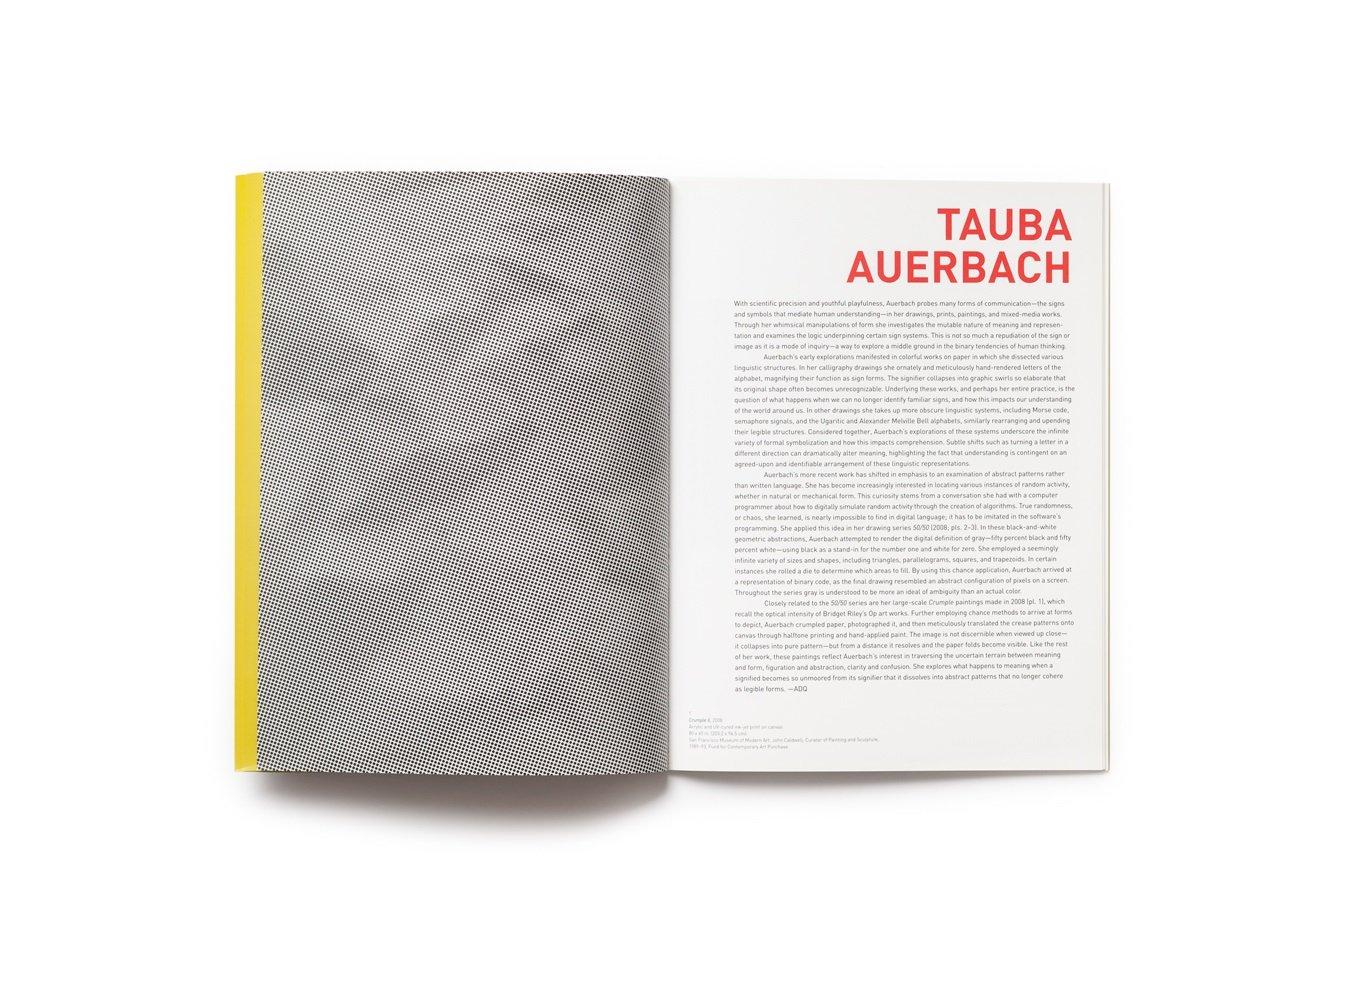 2008 SECA Art Award publication pages 4-5